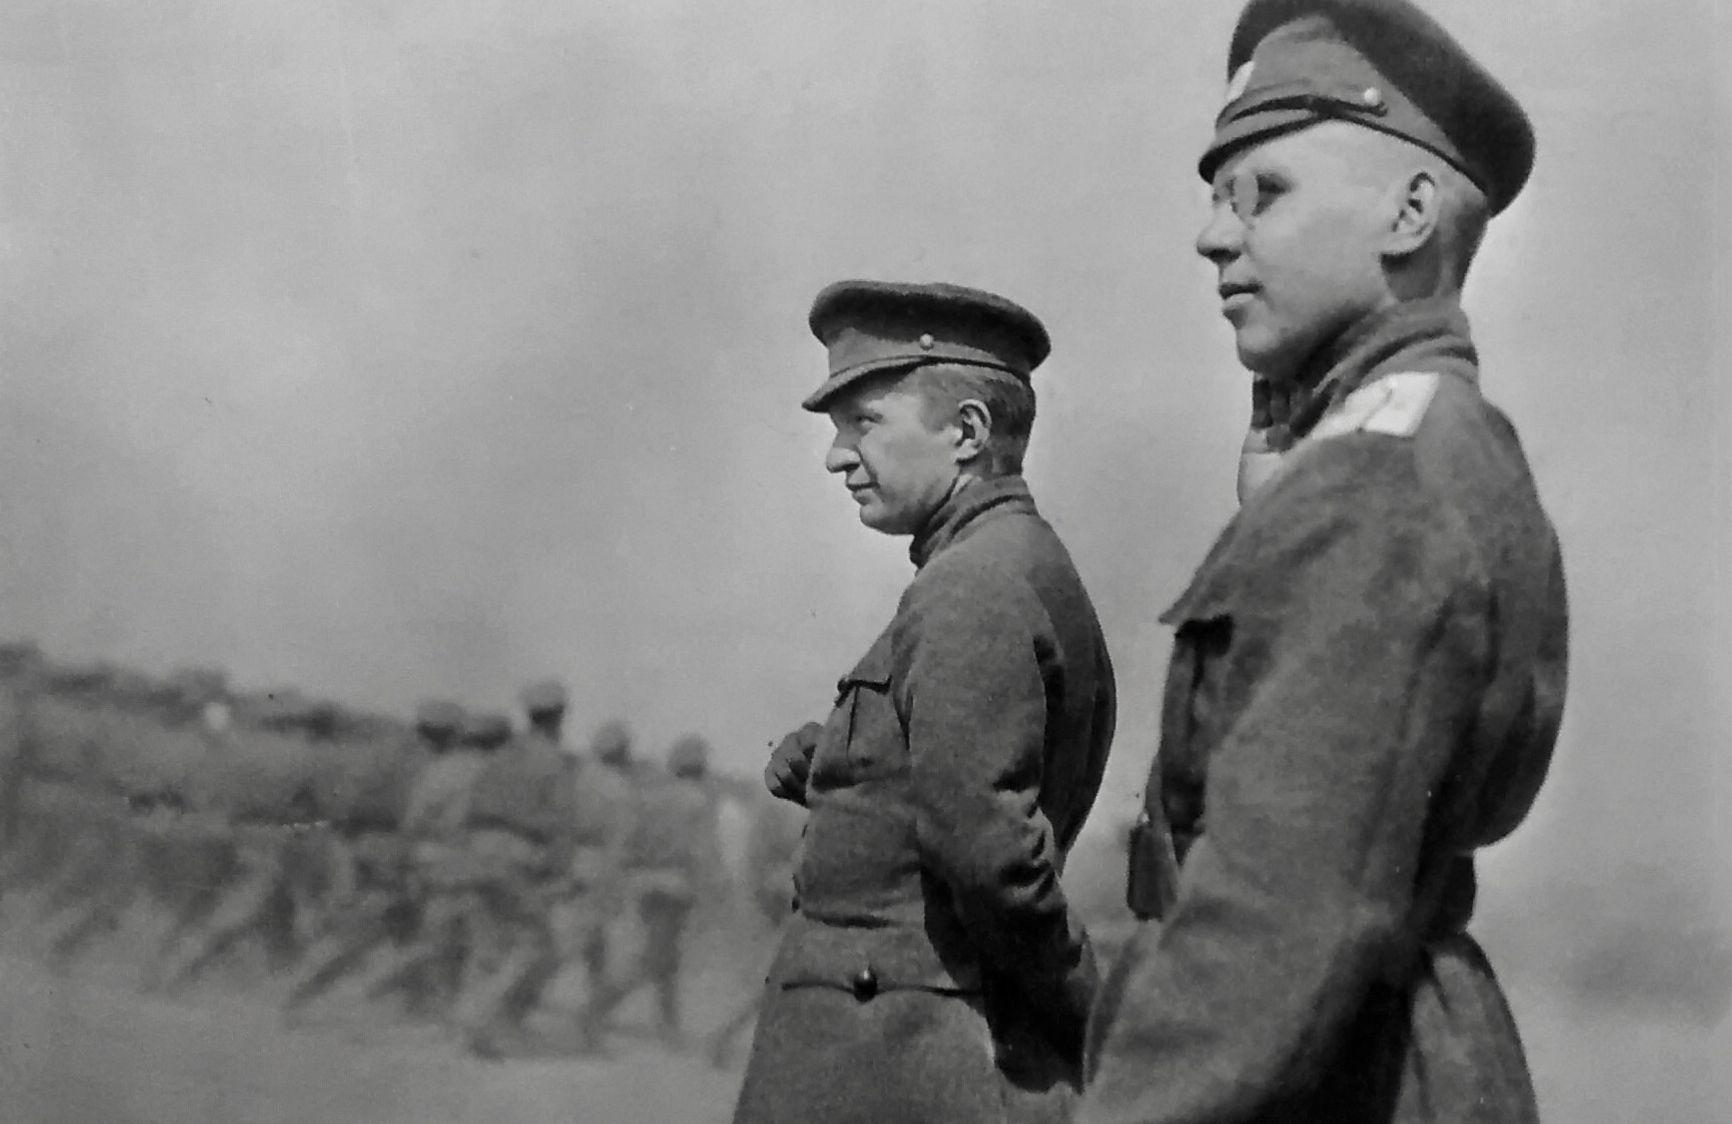 Керенский наблюдает за войсками на фронте. Лето 1917 г.